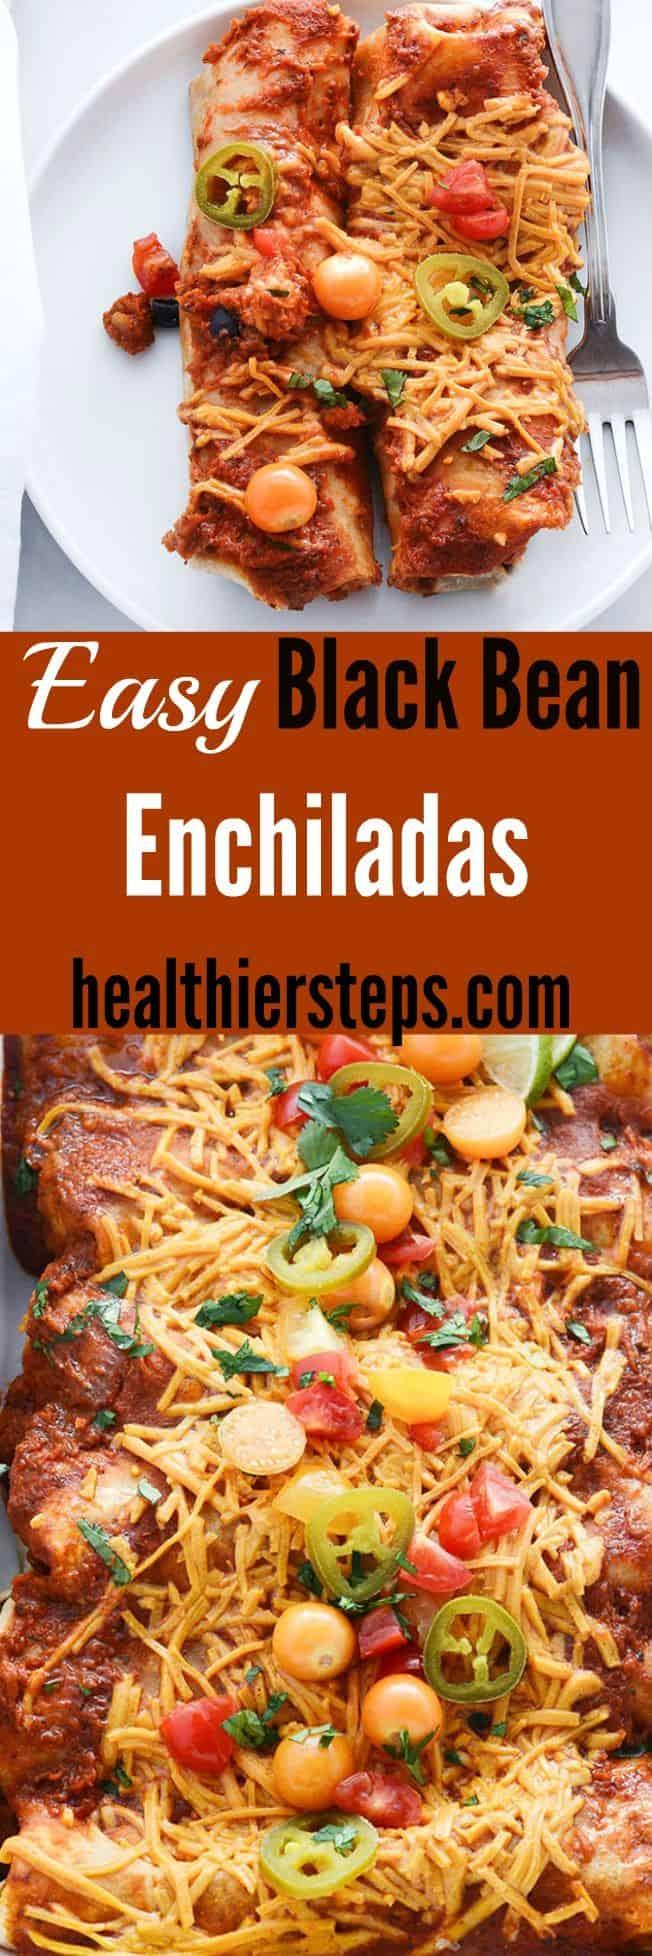 Easy Black Bean Enchiladas